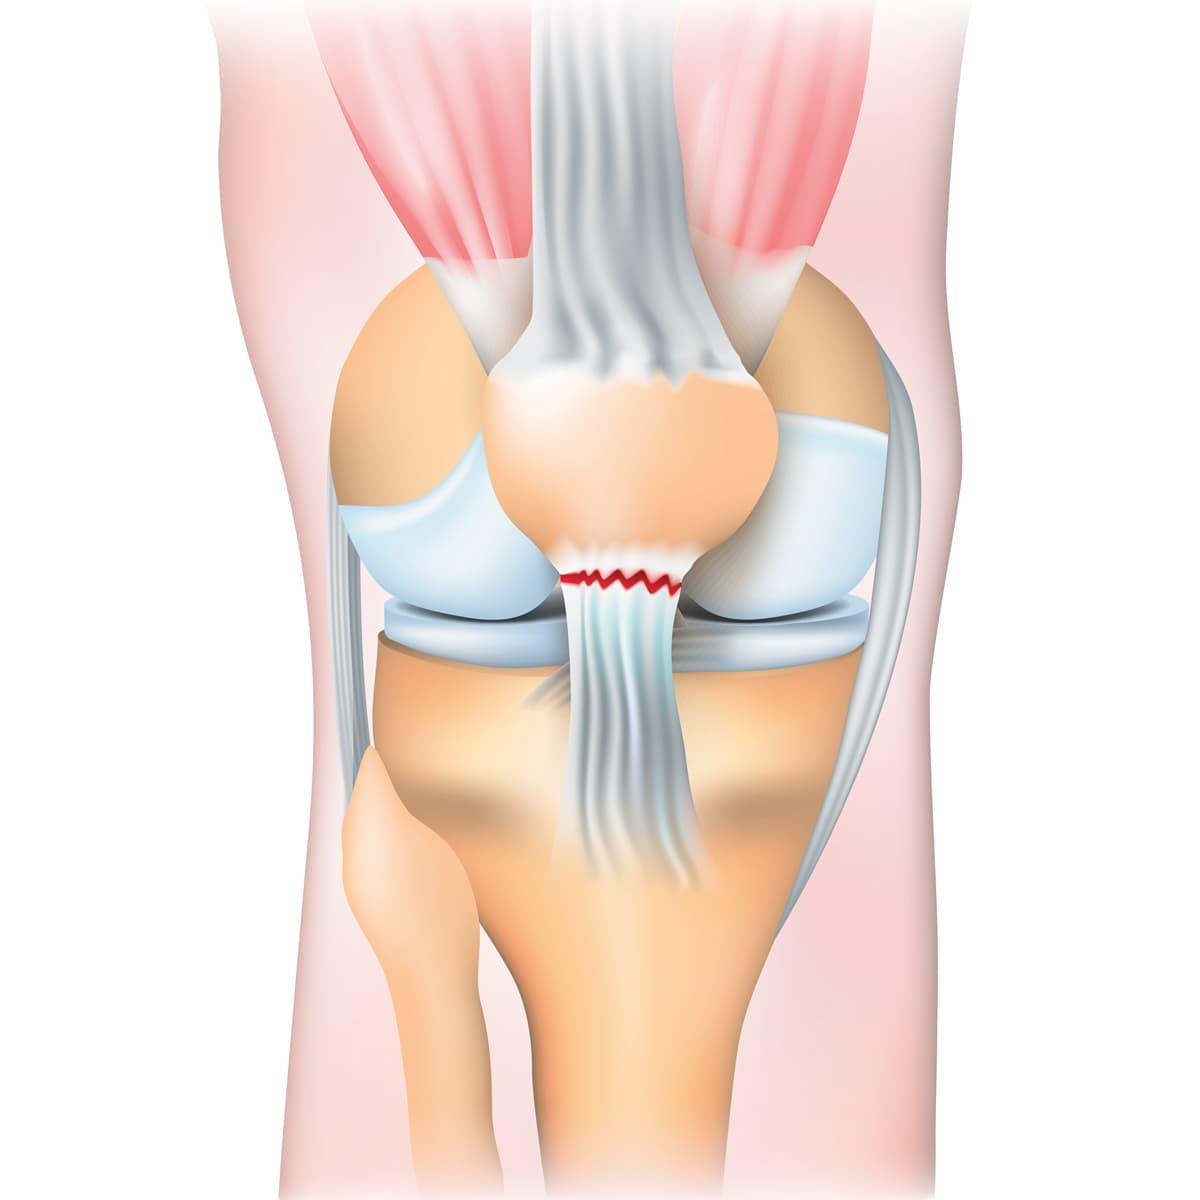 Schema illustrant la rupture du tendon rotulien